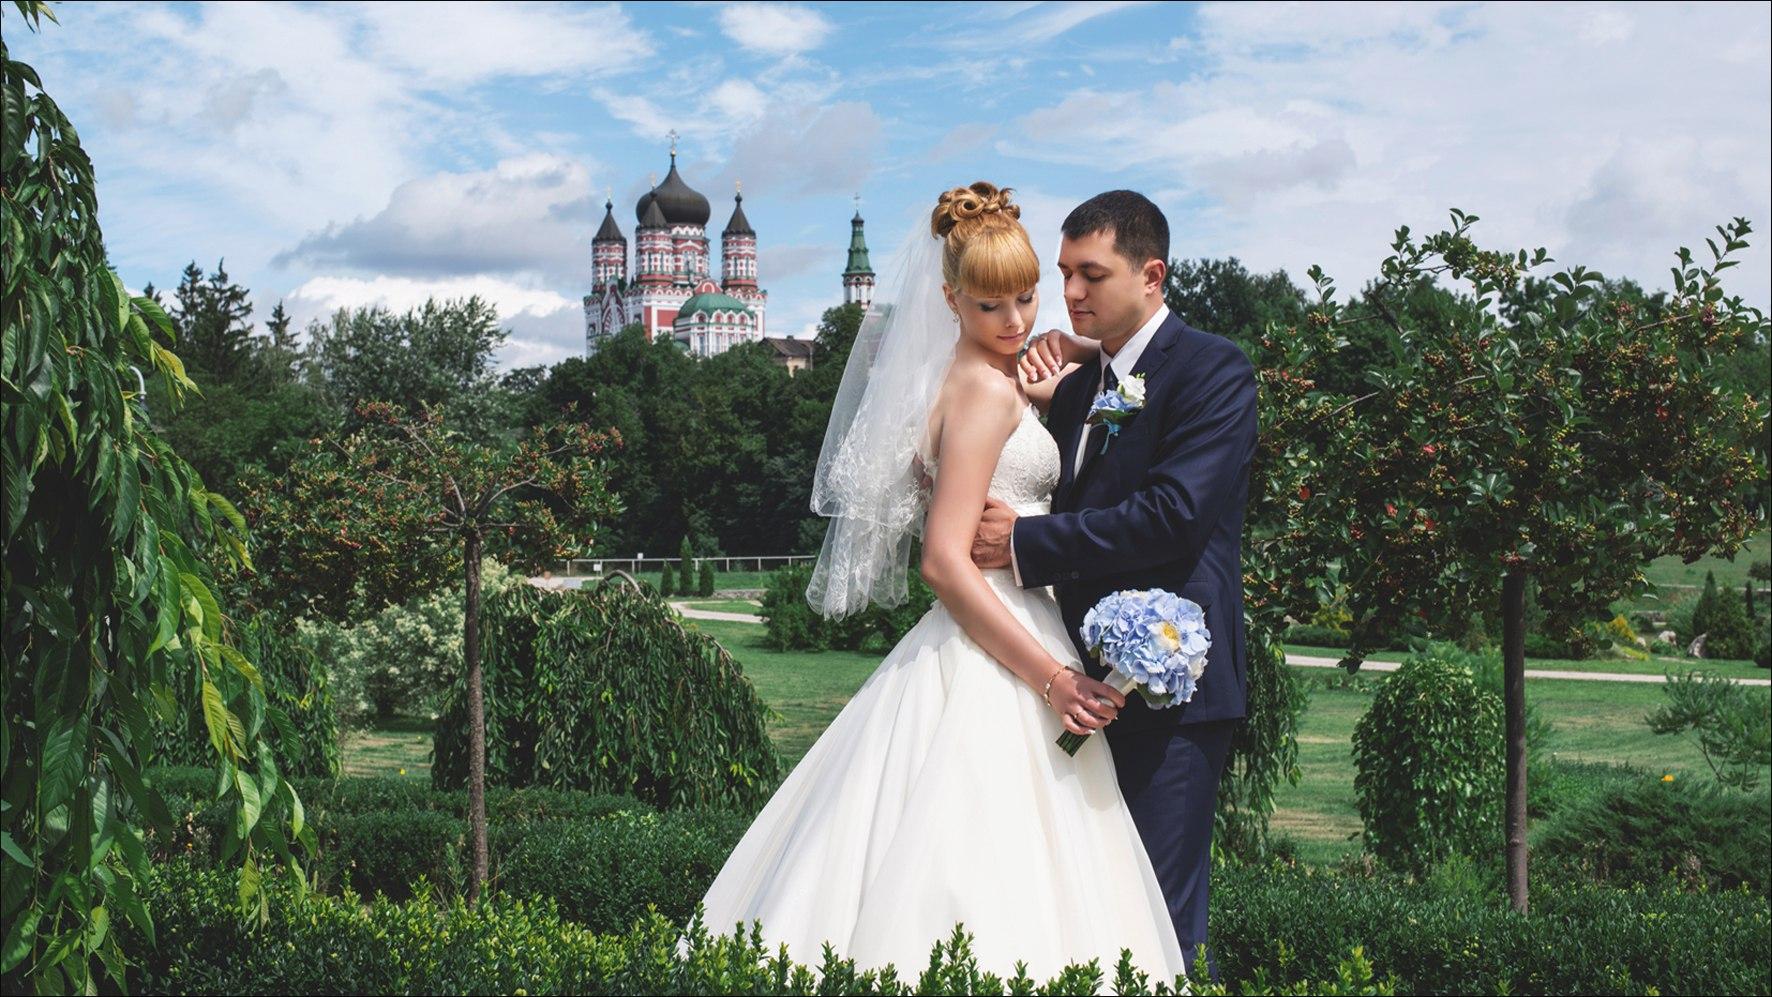 3CnuC54JcDI - Классика ошибок на свадебной фотосессии